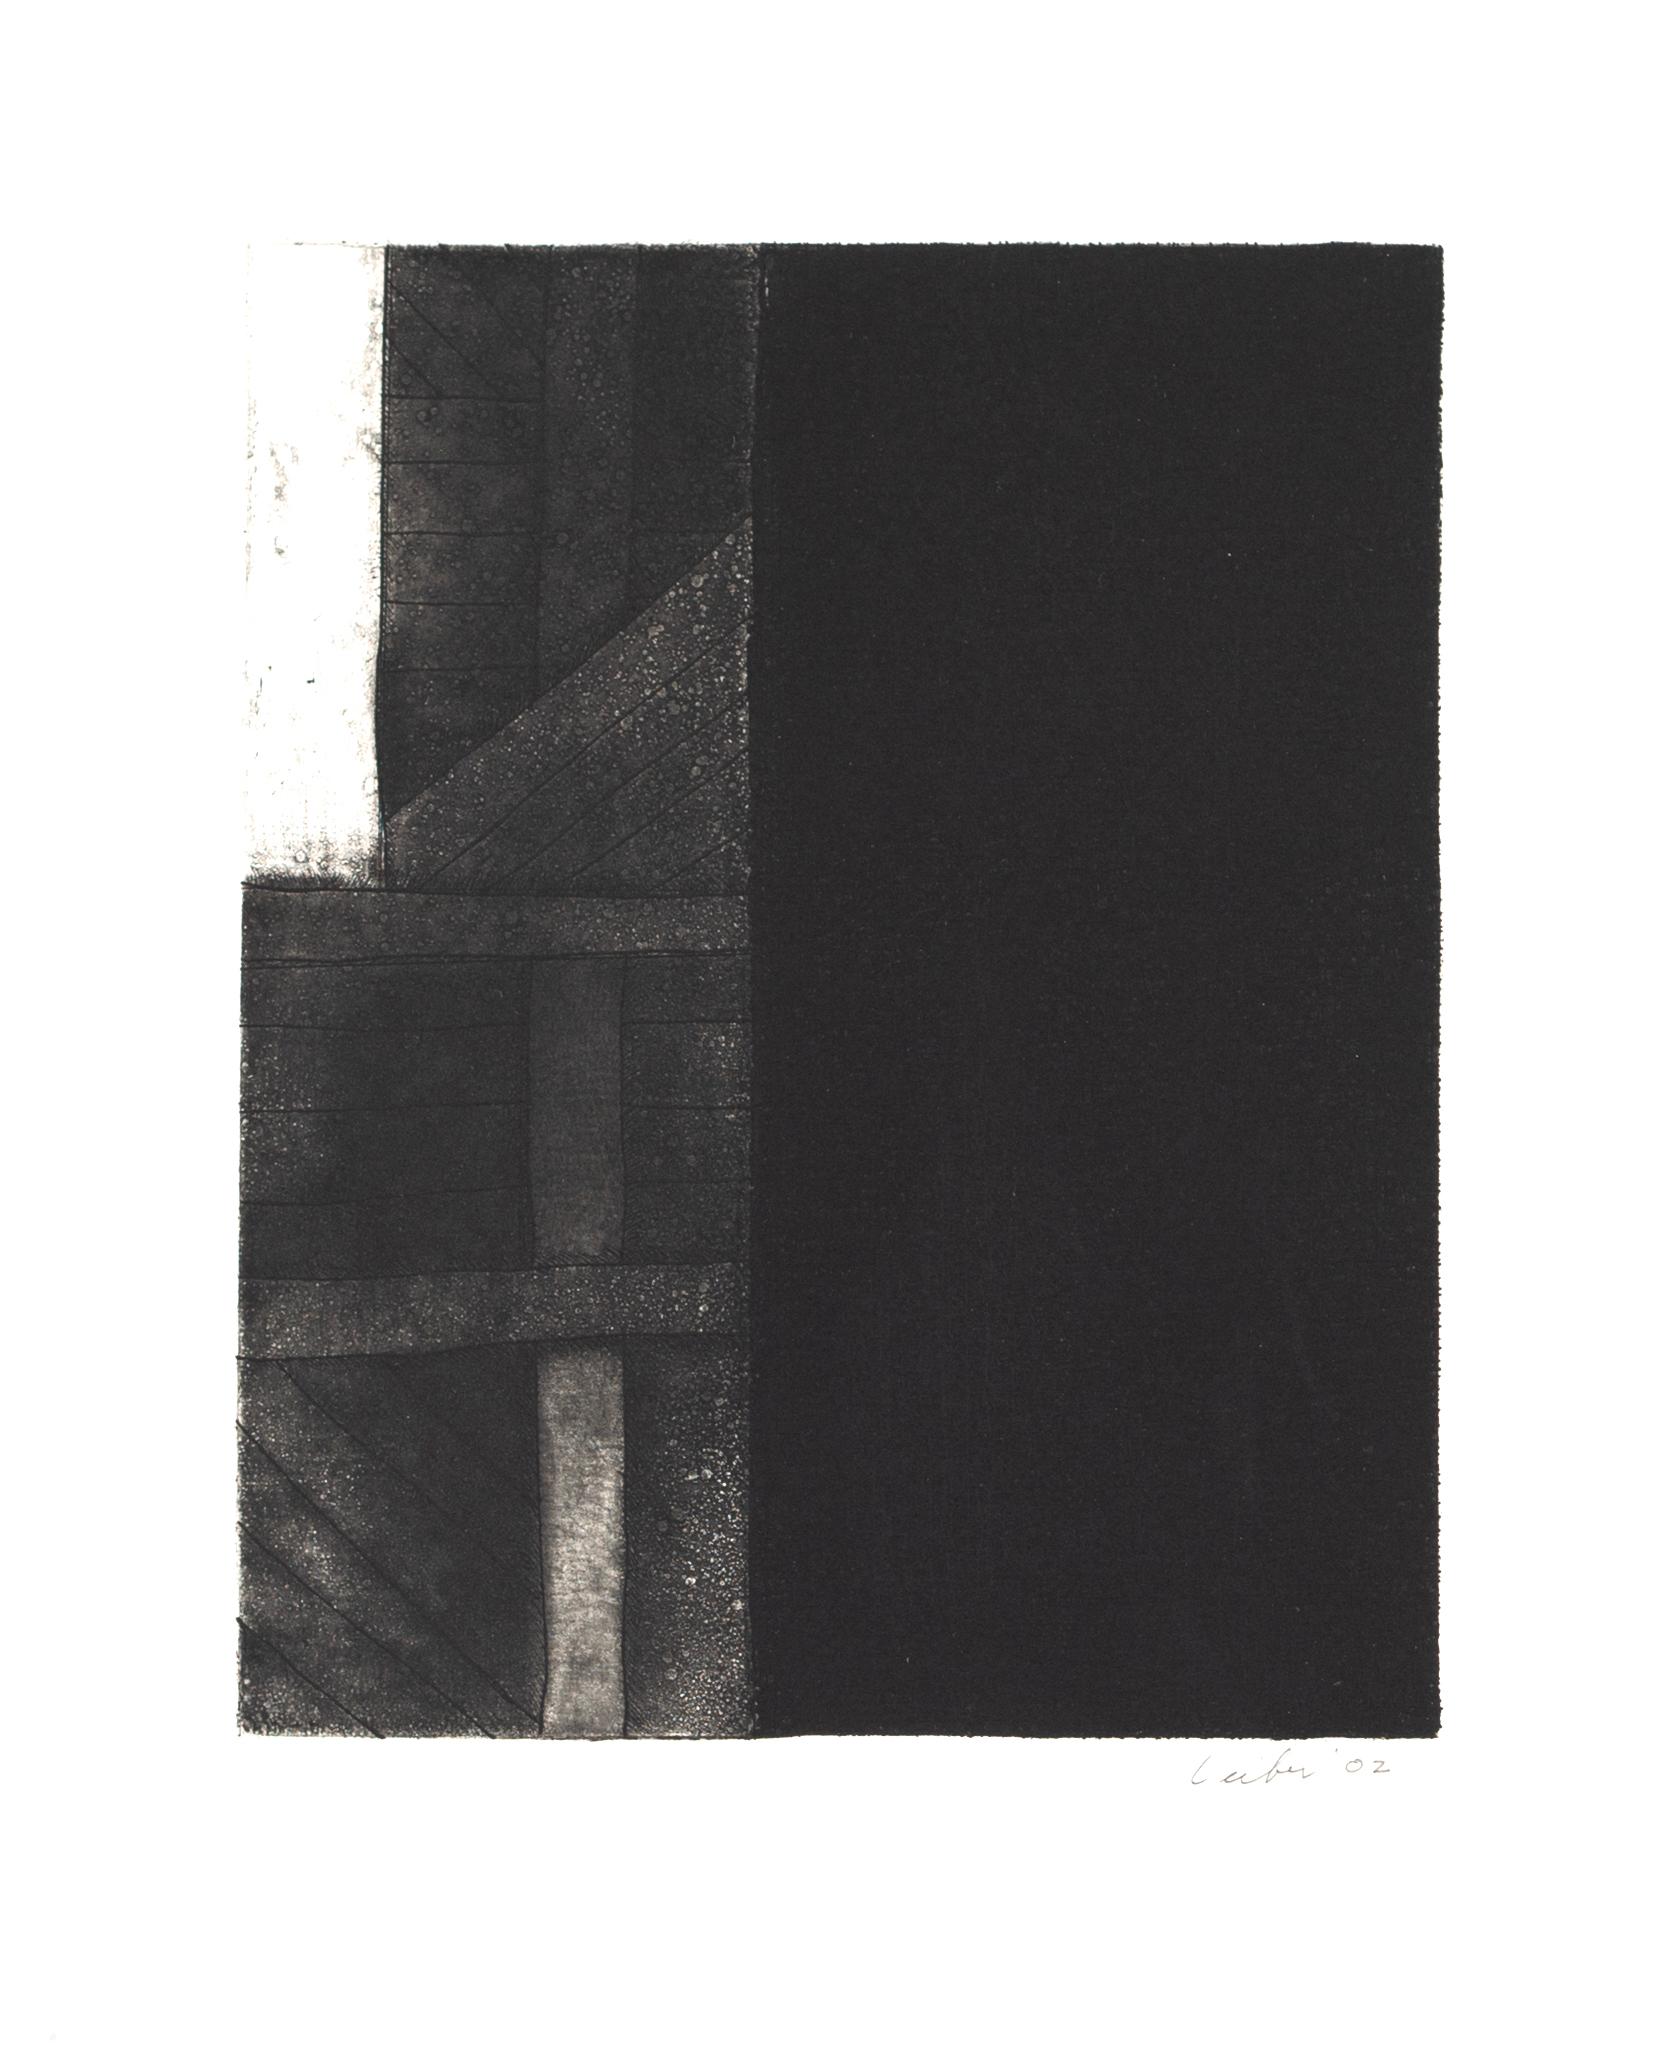 Number 9, 2002